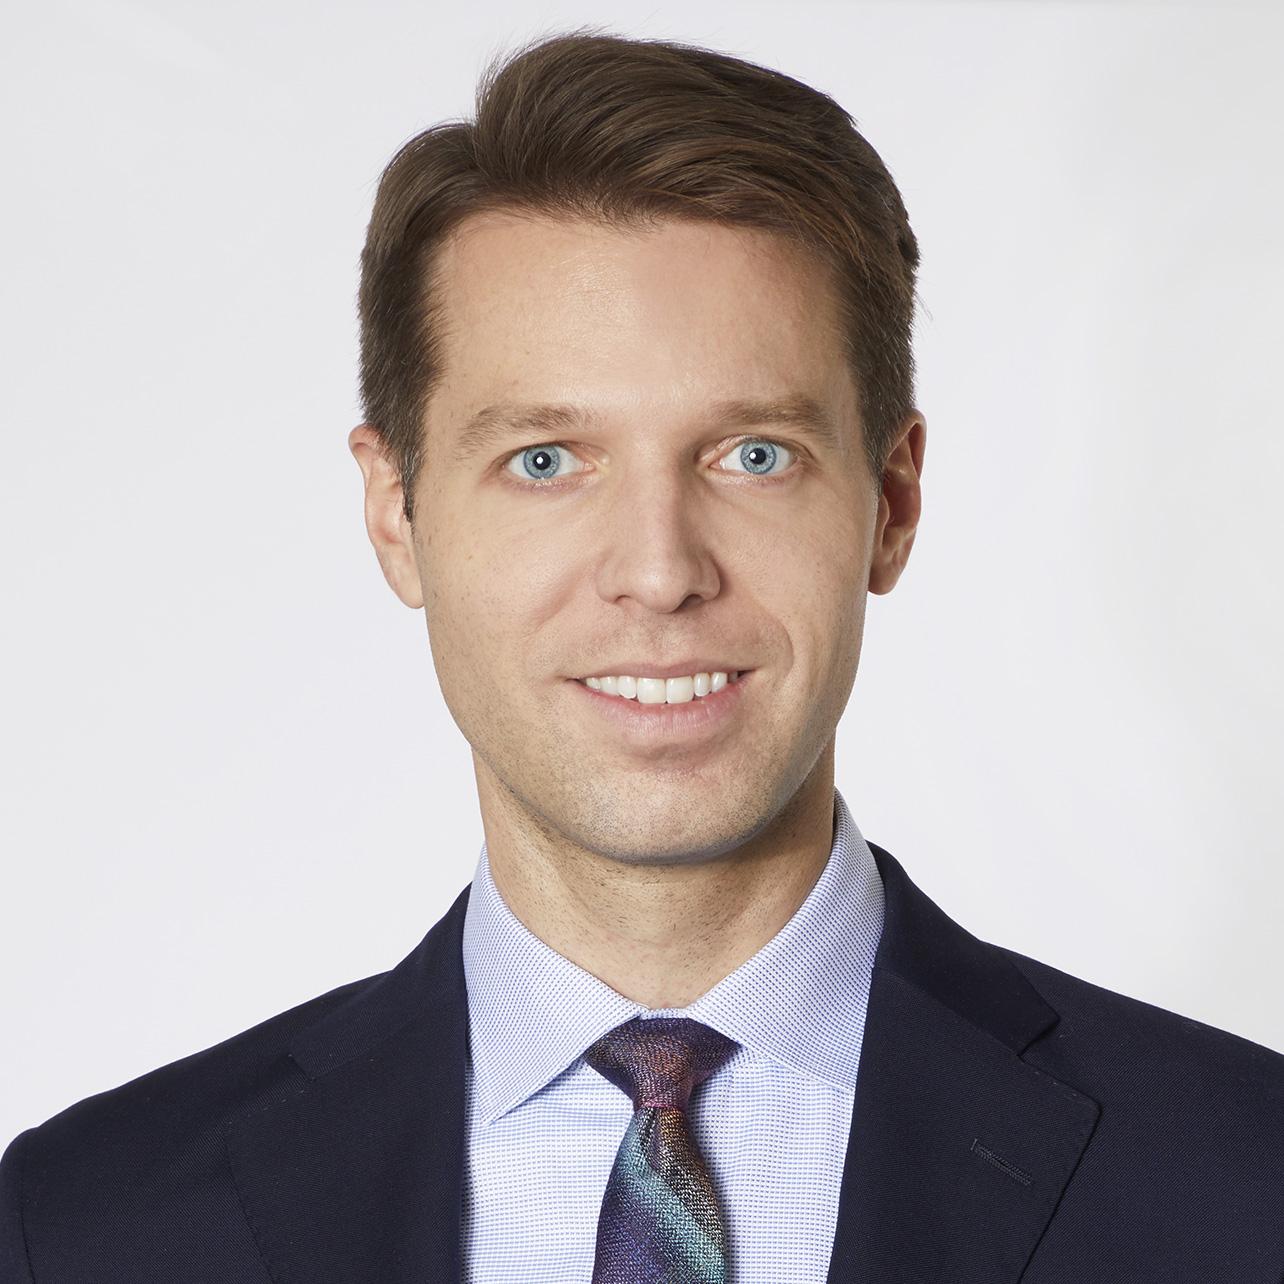 Aaron F. Mertz, Ph.D.